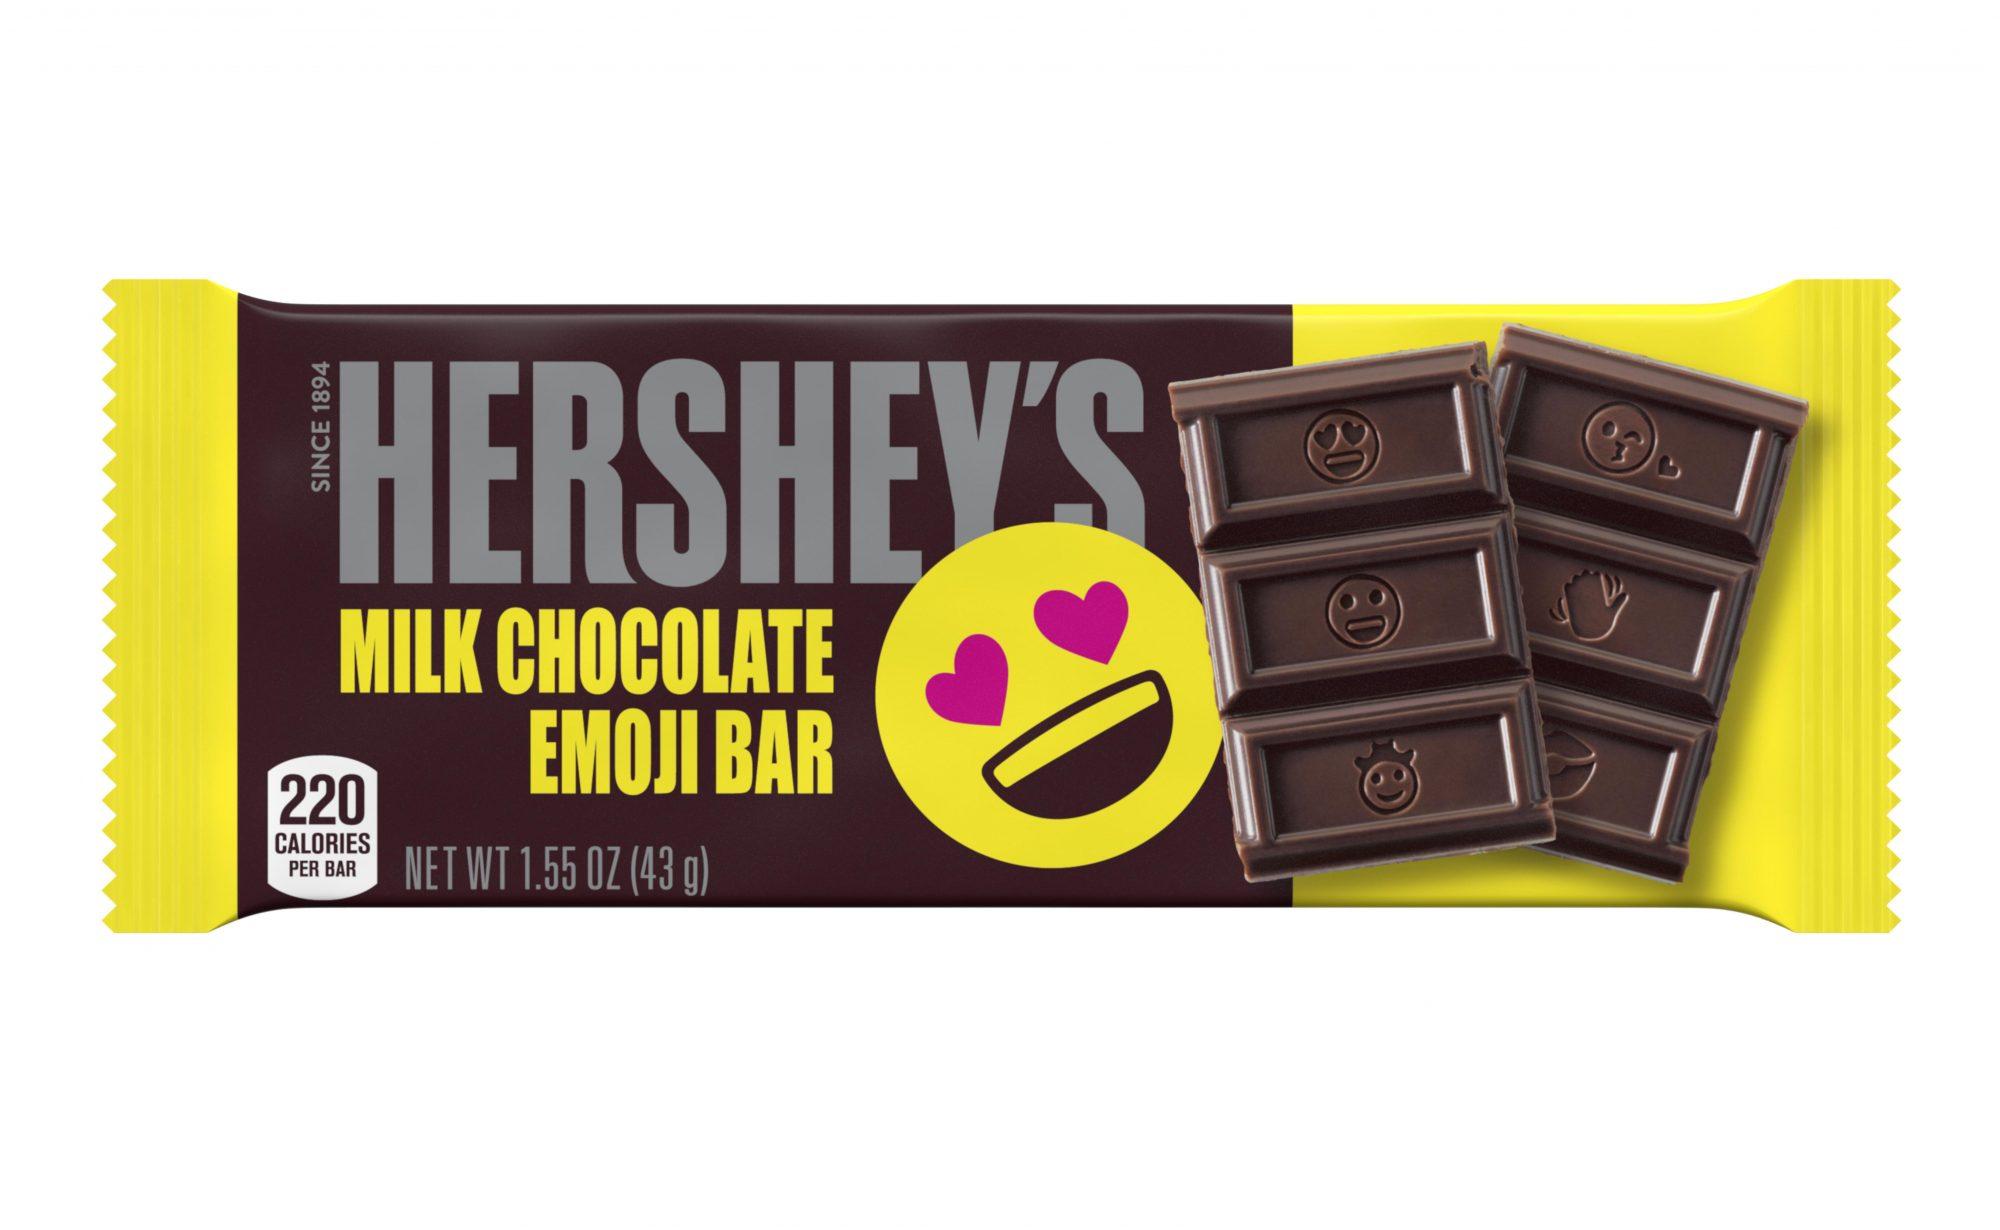 Hershey's Emoji Bar (Wrapped)